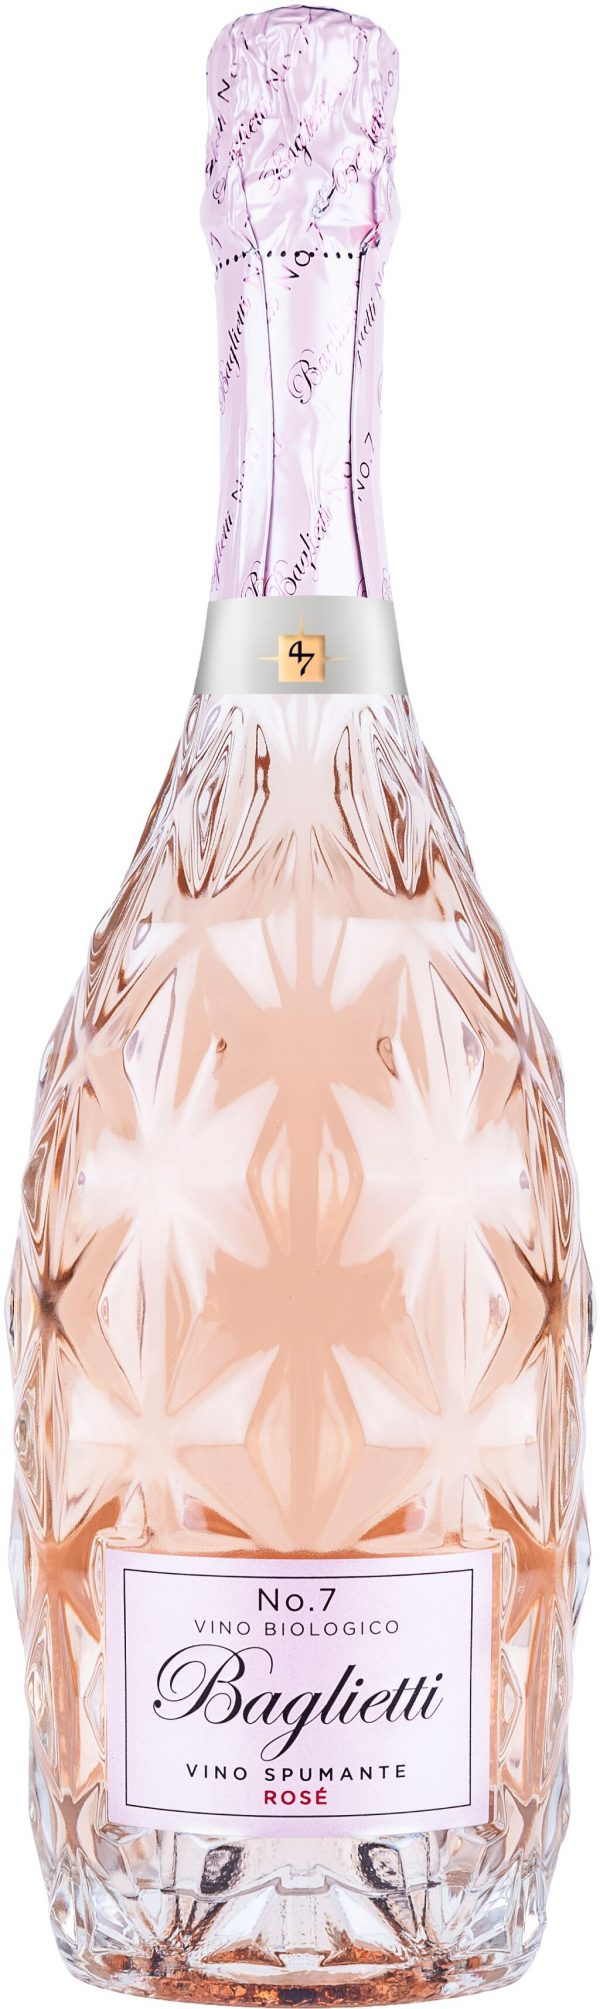 Baglietti Rosé No7 75cl